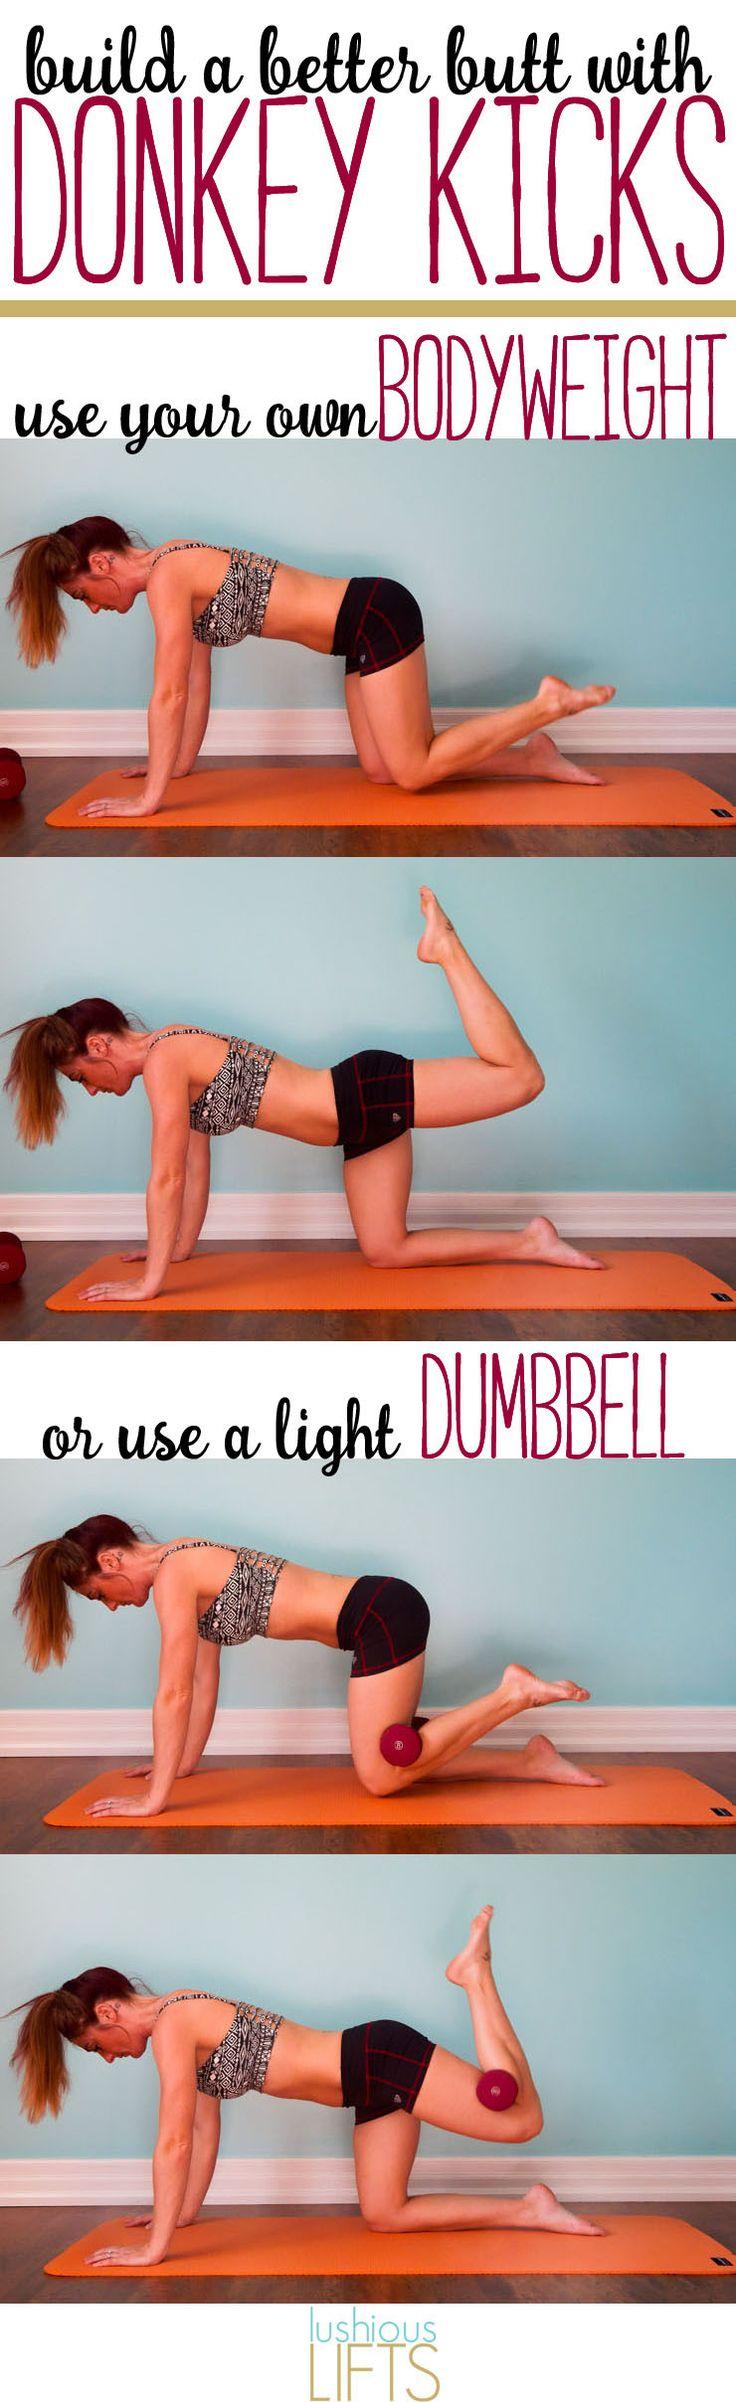 Build a Better Butt with Donkey Kicks || lushiouslifts.com